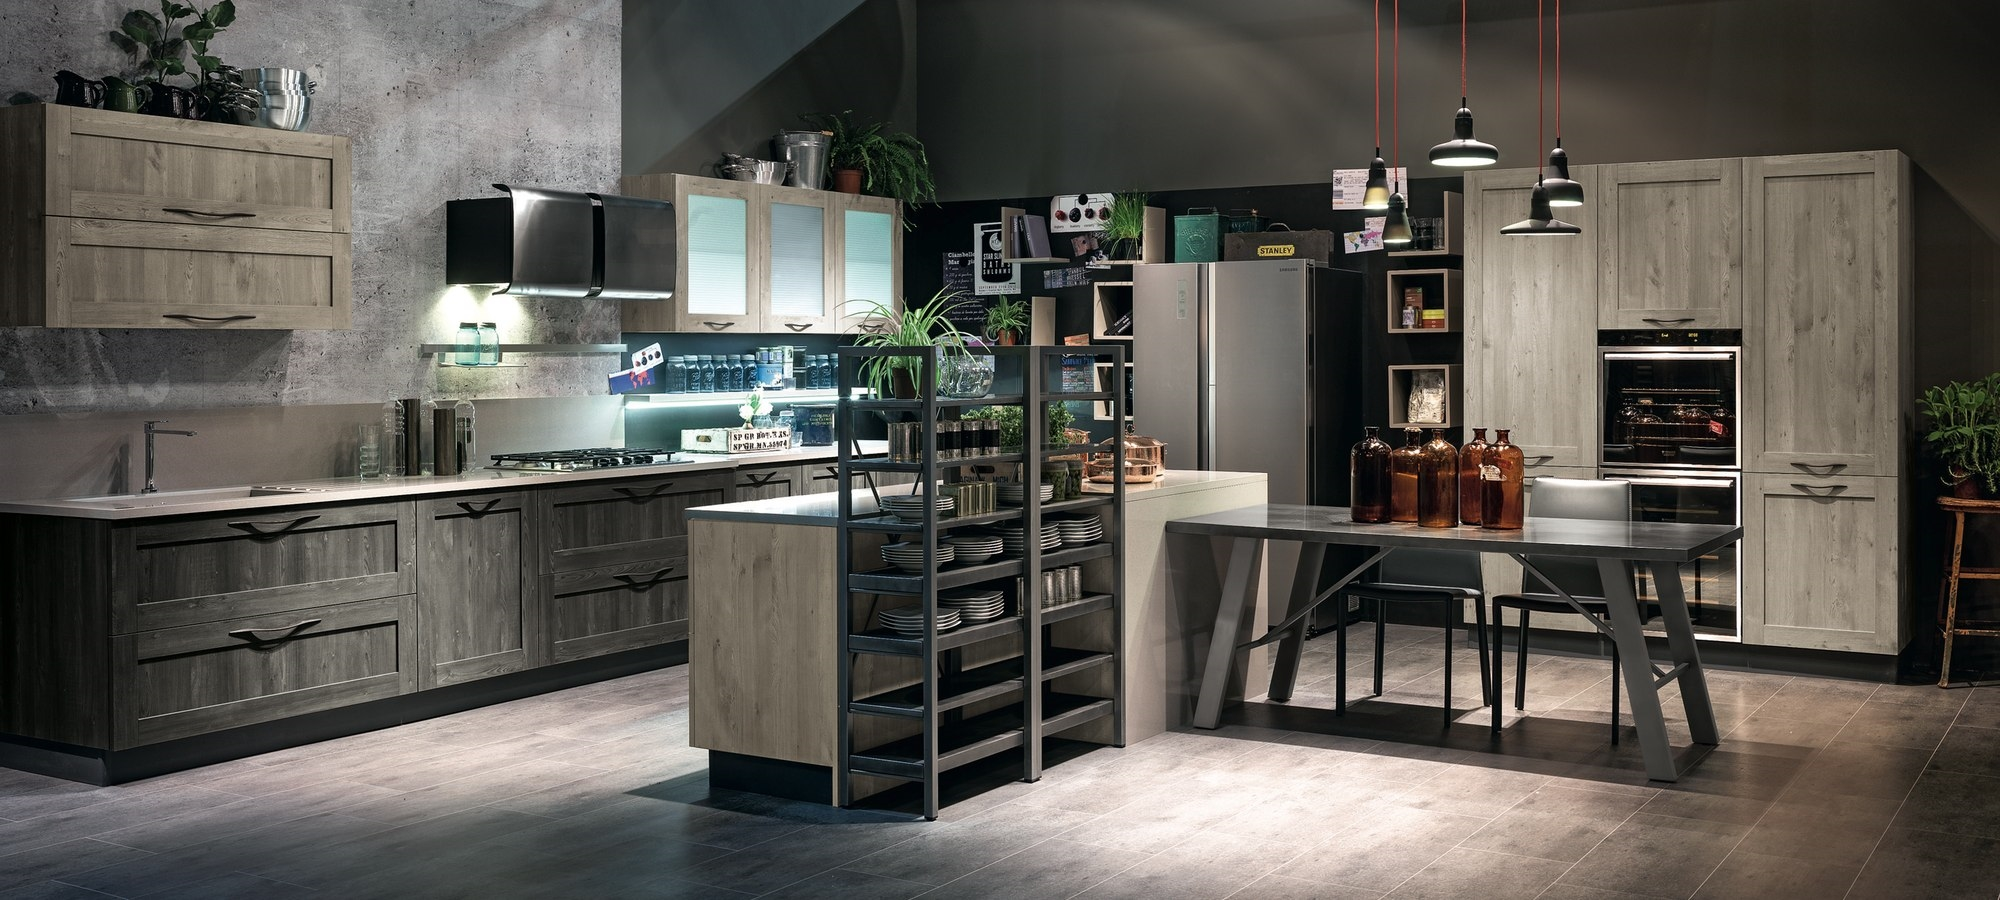 Cucina stosa cucine city composizione tipo 01 cucine a - Cucina city stosa ...